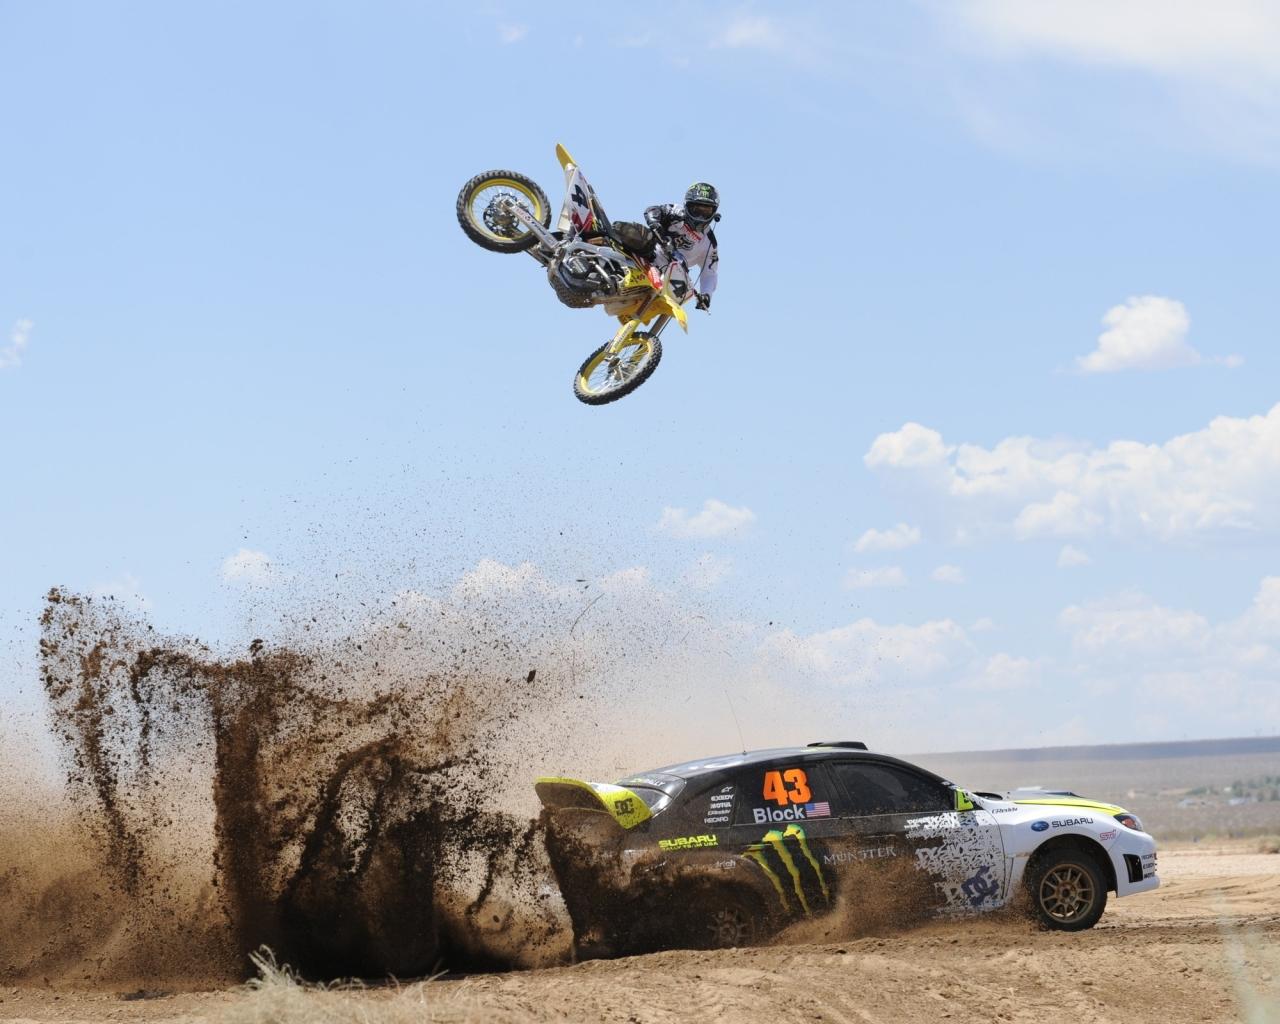 Salto de moto sobre auto - 1280x1024